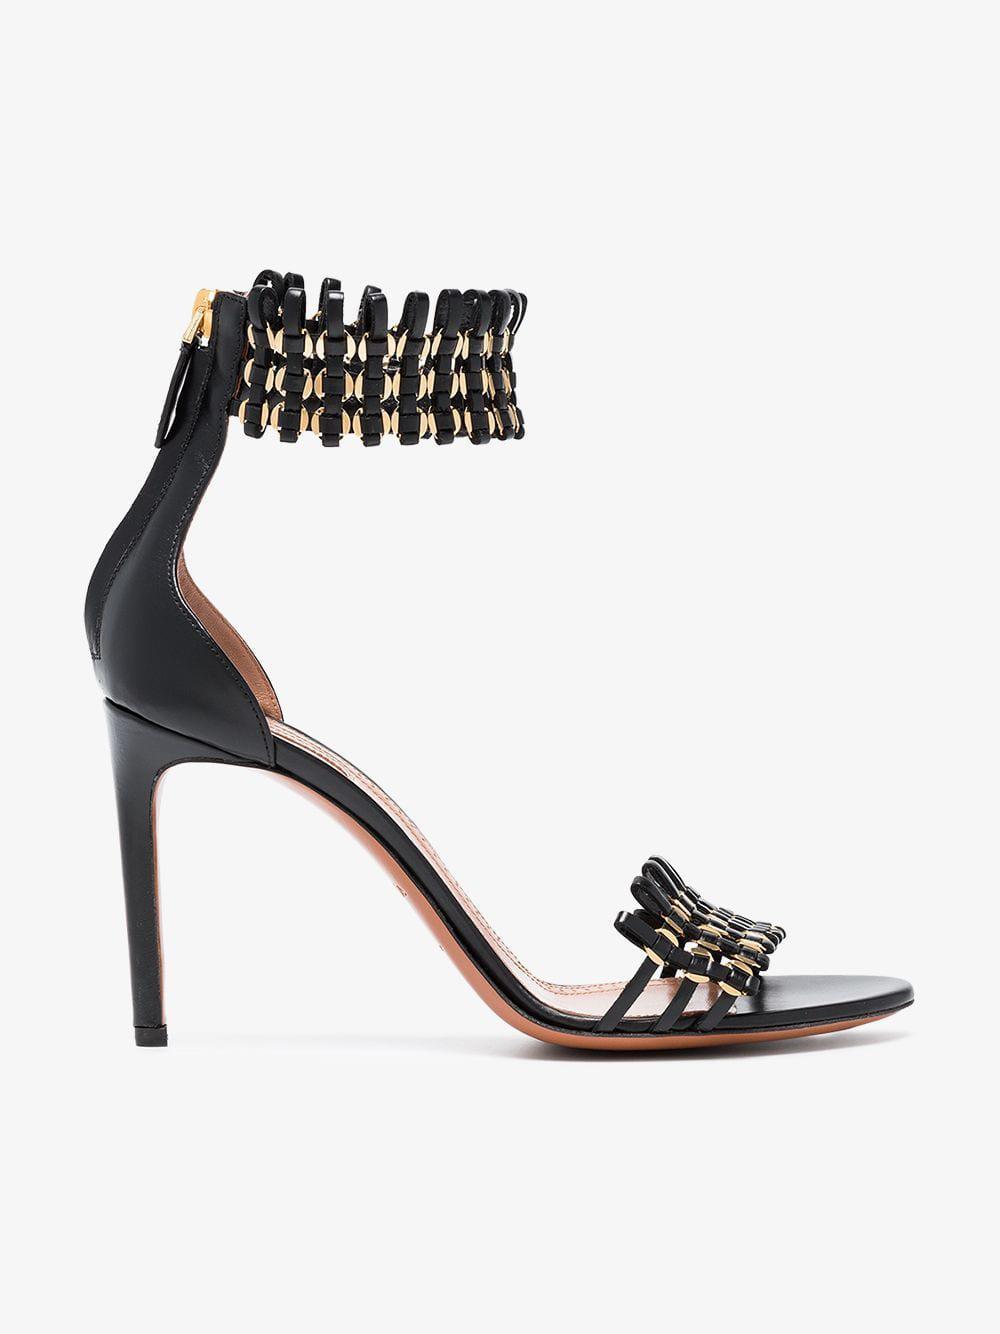 339e8329f7cd Alaïa 90 Cage Sandals in Black - Lyst